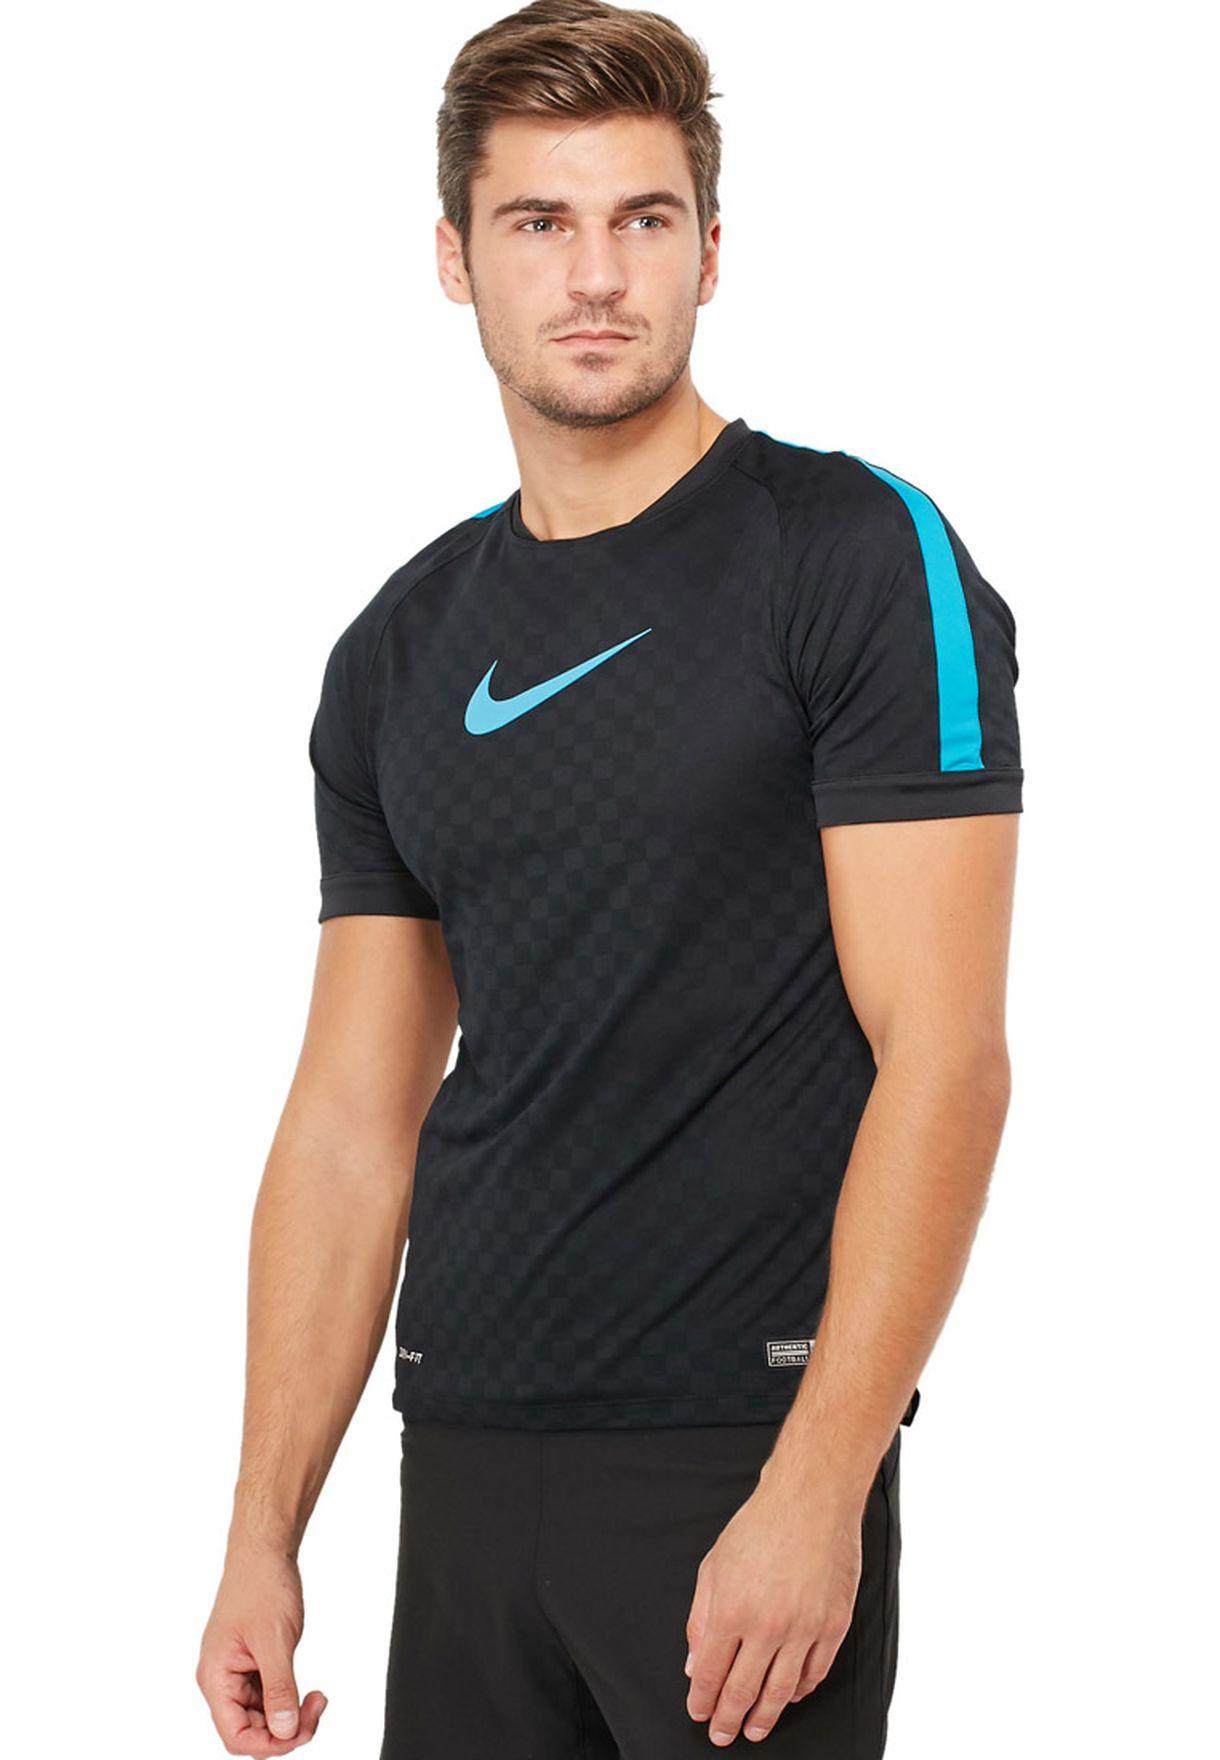 03a7a1ca848 Shop Nike black Football T-Shirt 631893-010 for Men in Kuwait ...